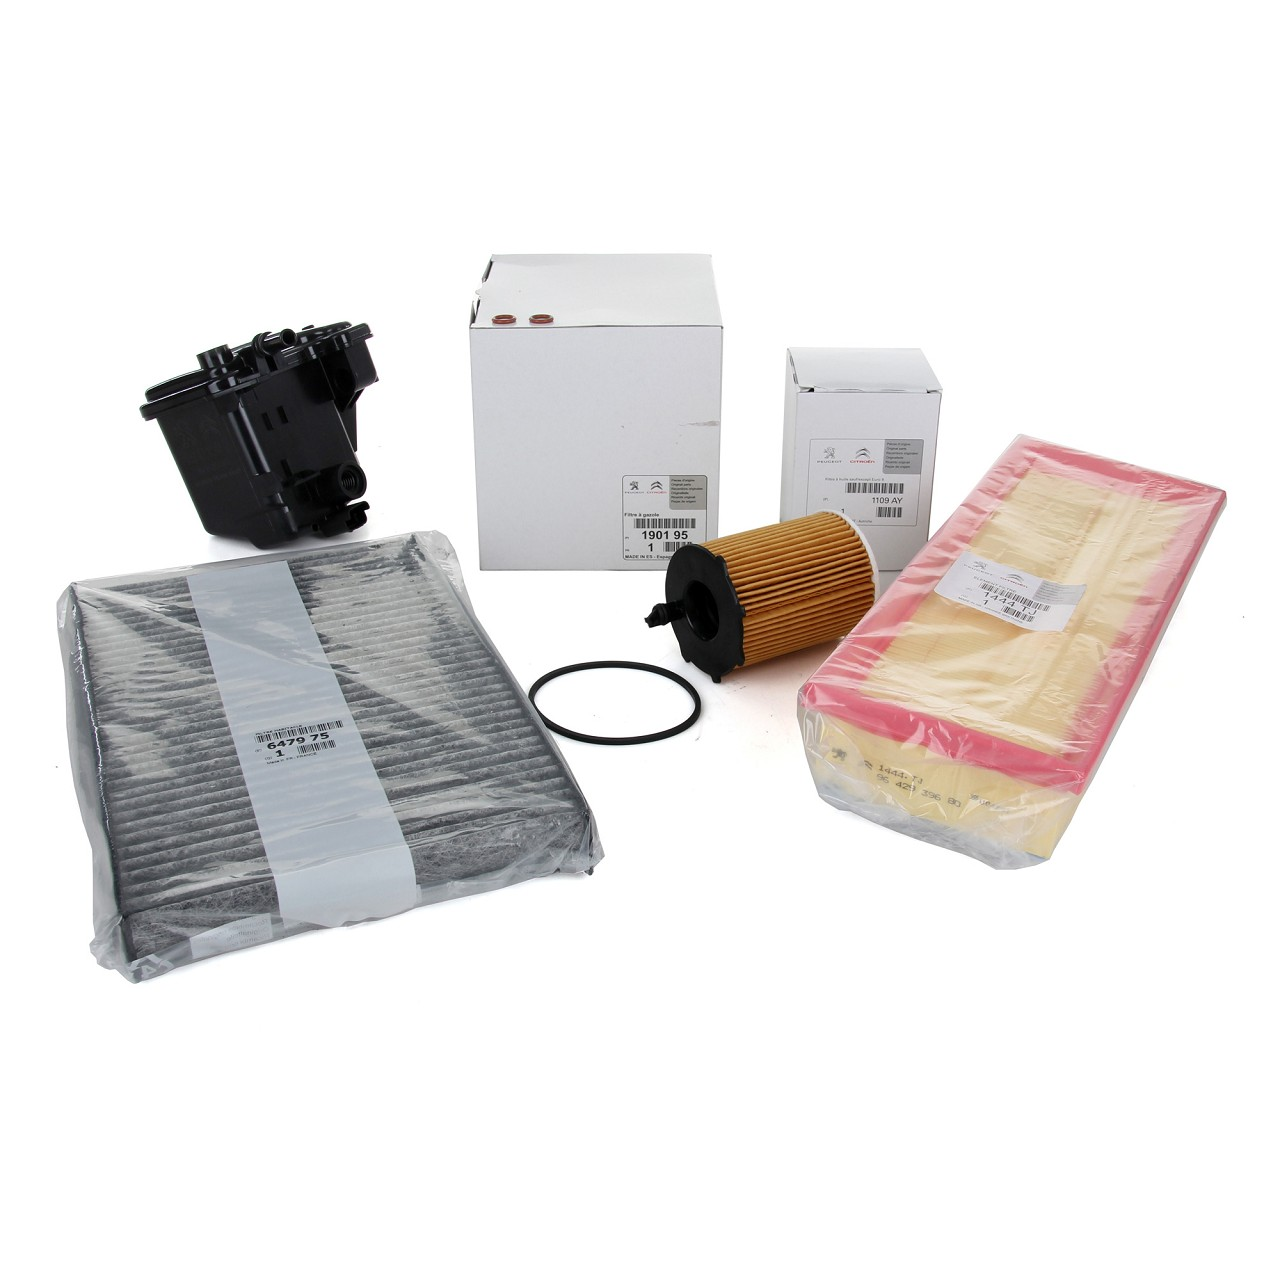 ORIGINAL PEUGEOT CITROEN Inspektionsset Filterset 307 308 C3 C4 1.6HDI 90 109 PS